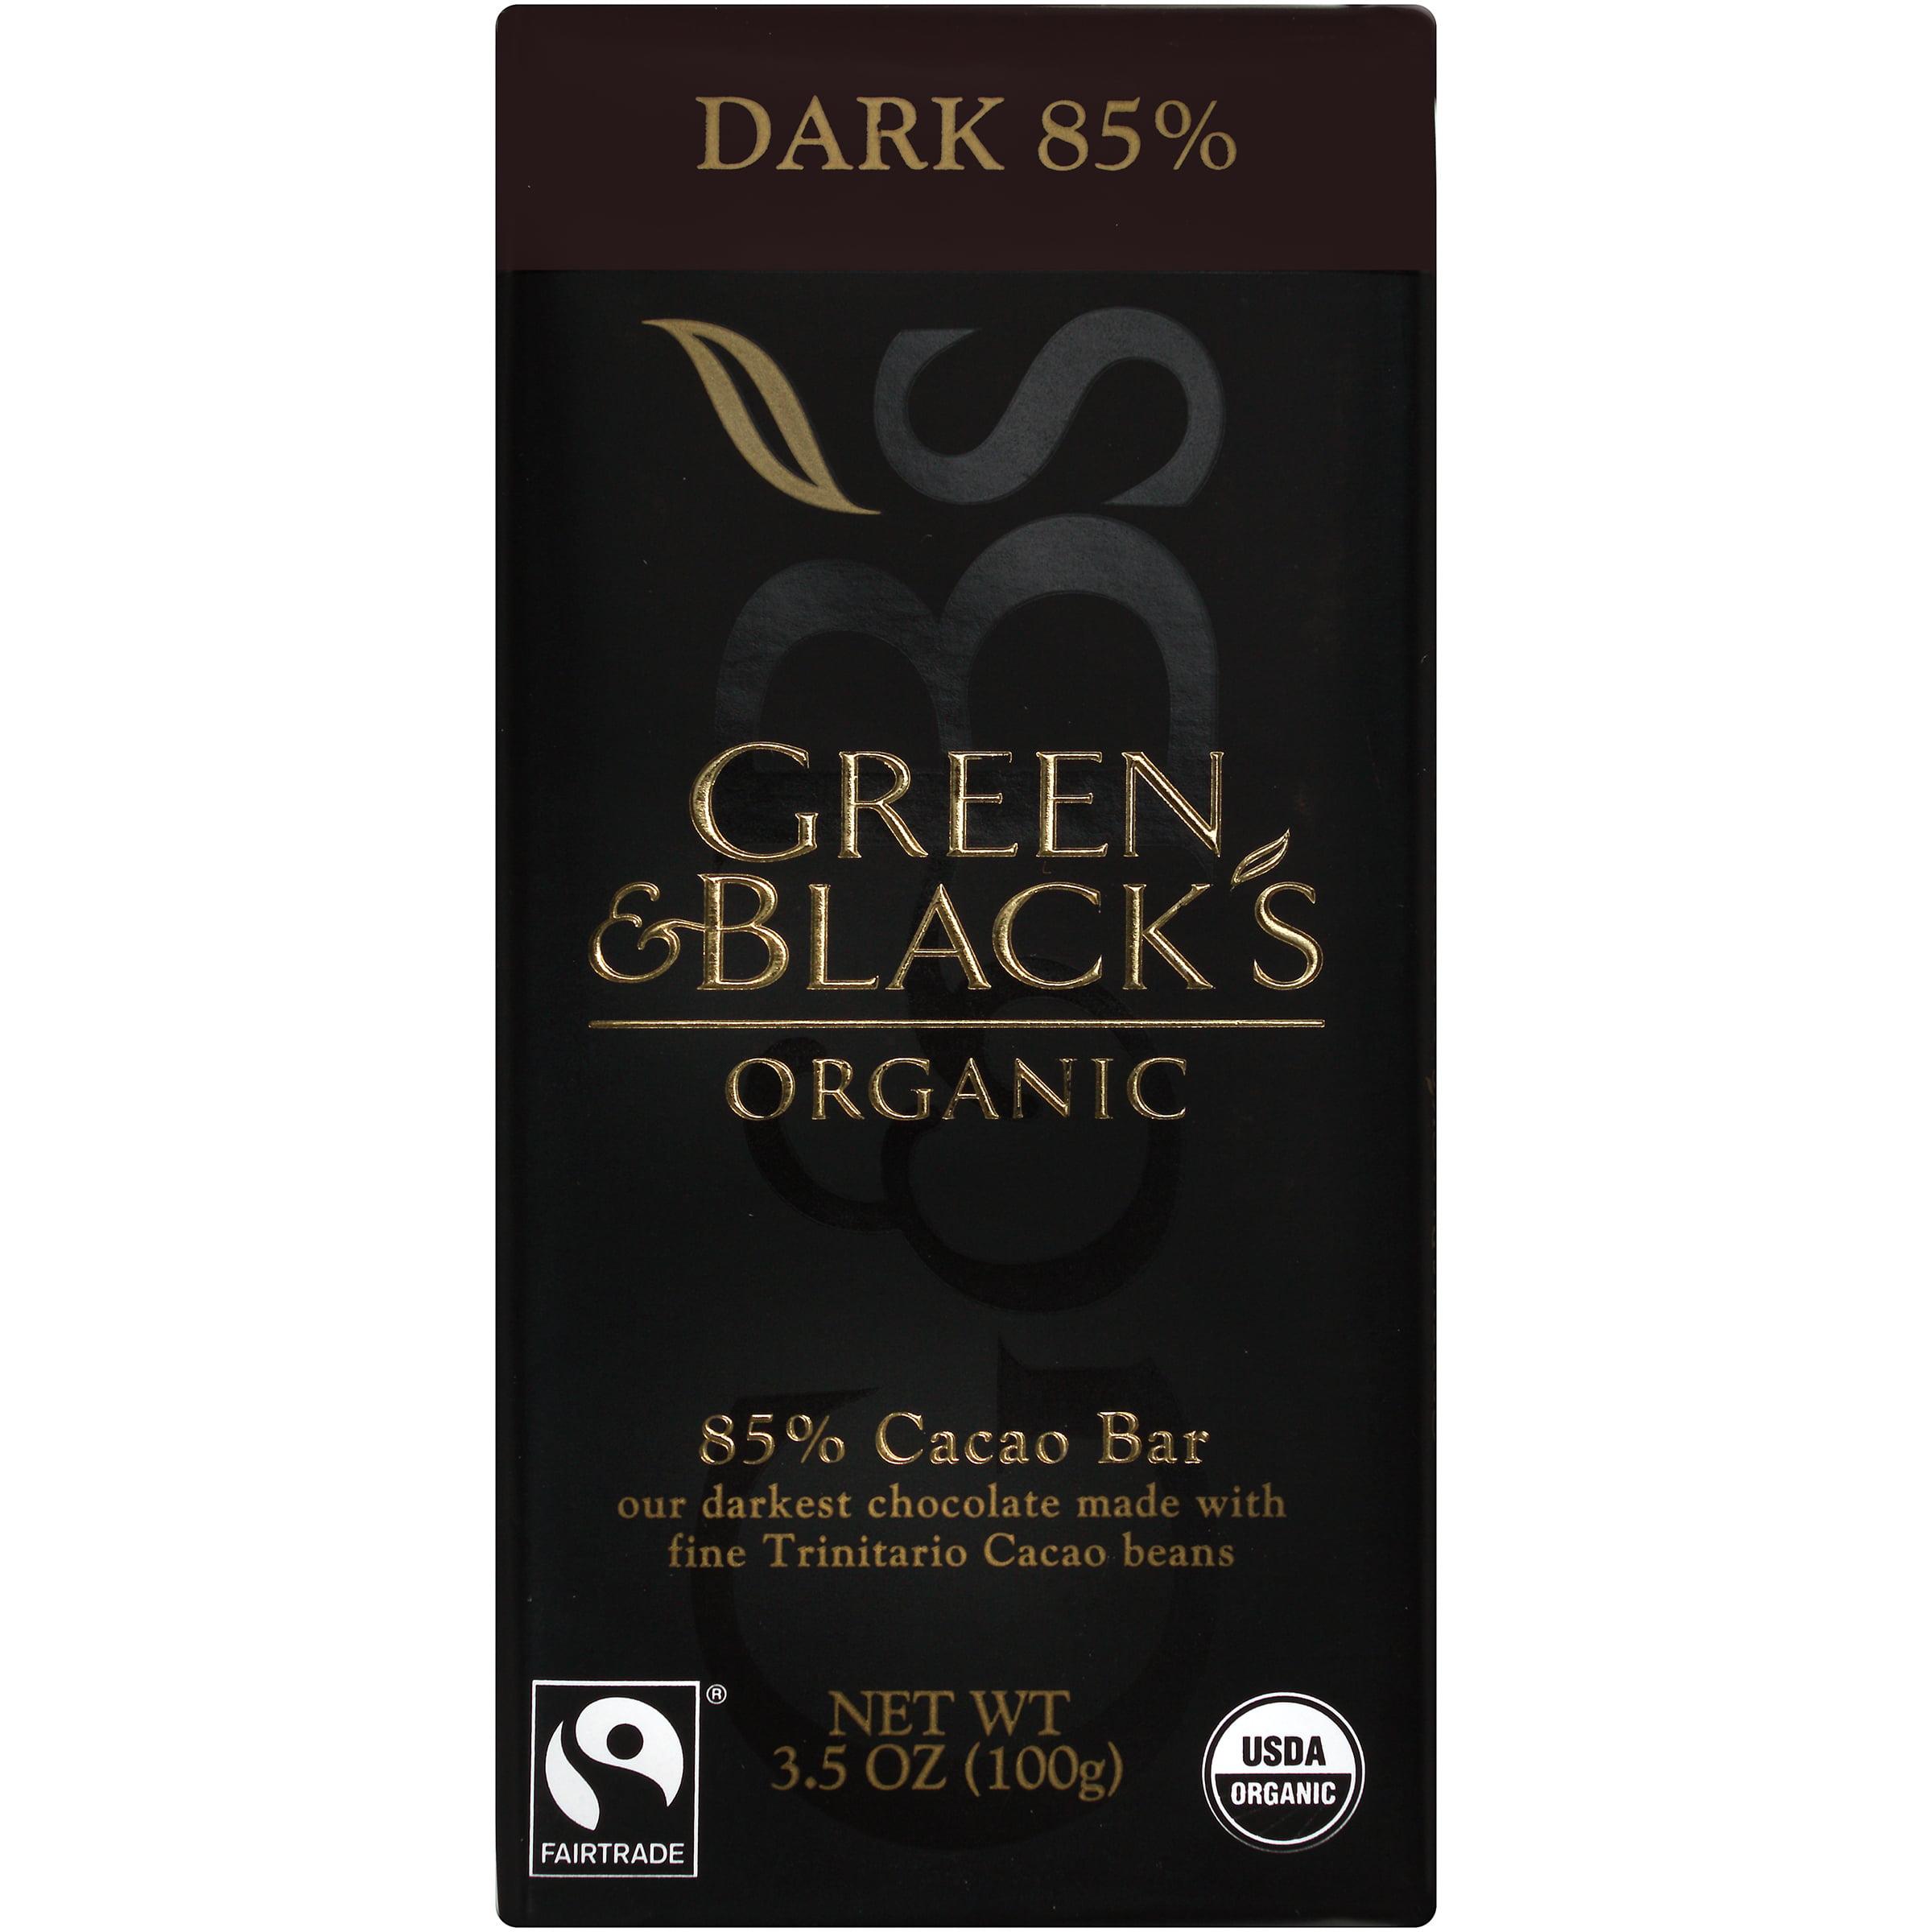 Green and Black's Organic Dark 85% Dark Chocolate, 3.5 OZ ...